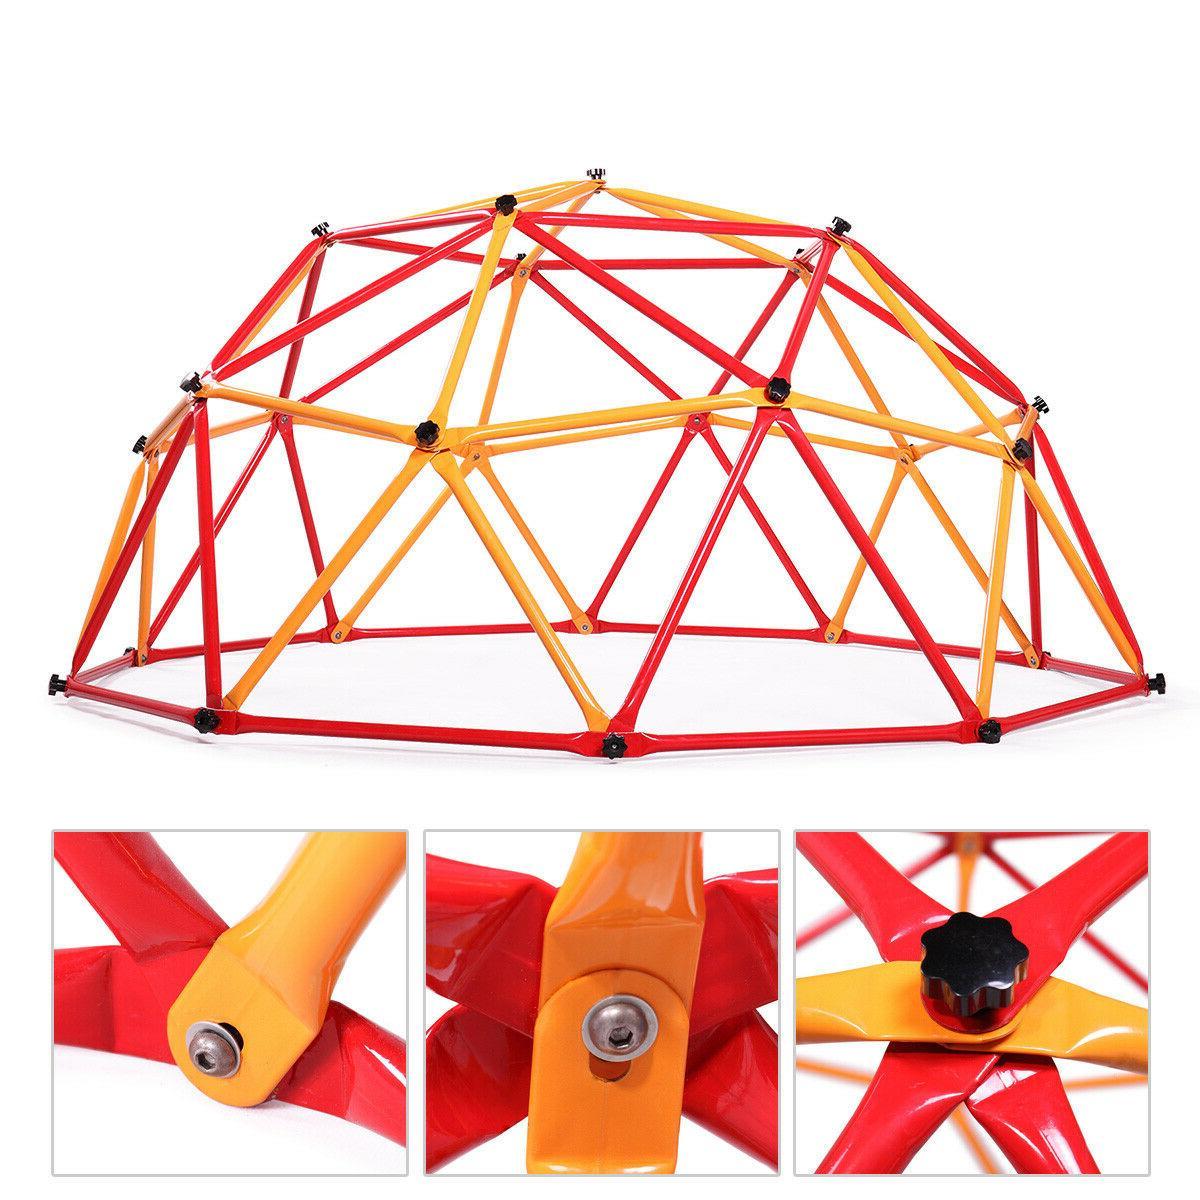 Kids Dome Space Climber Playground  Play set Outdoor Climbin